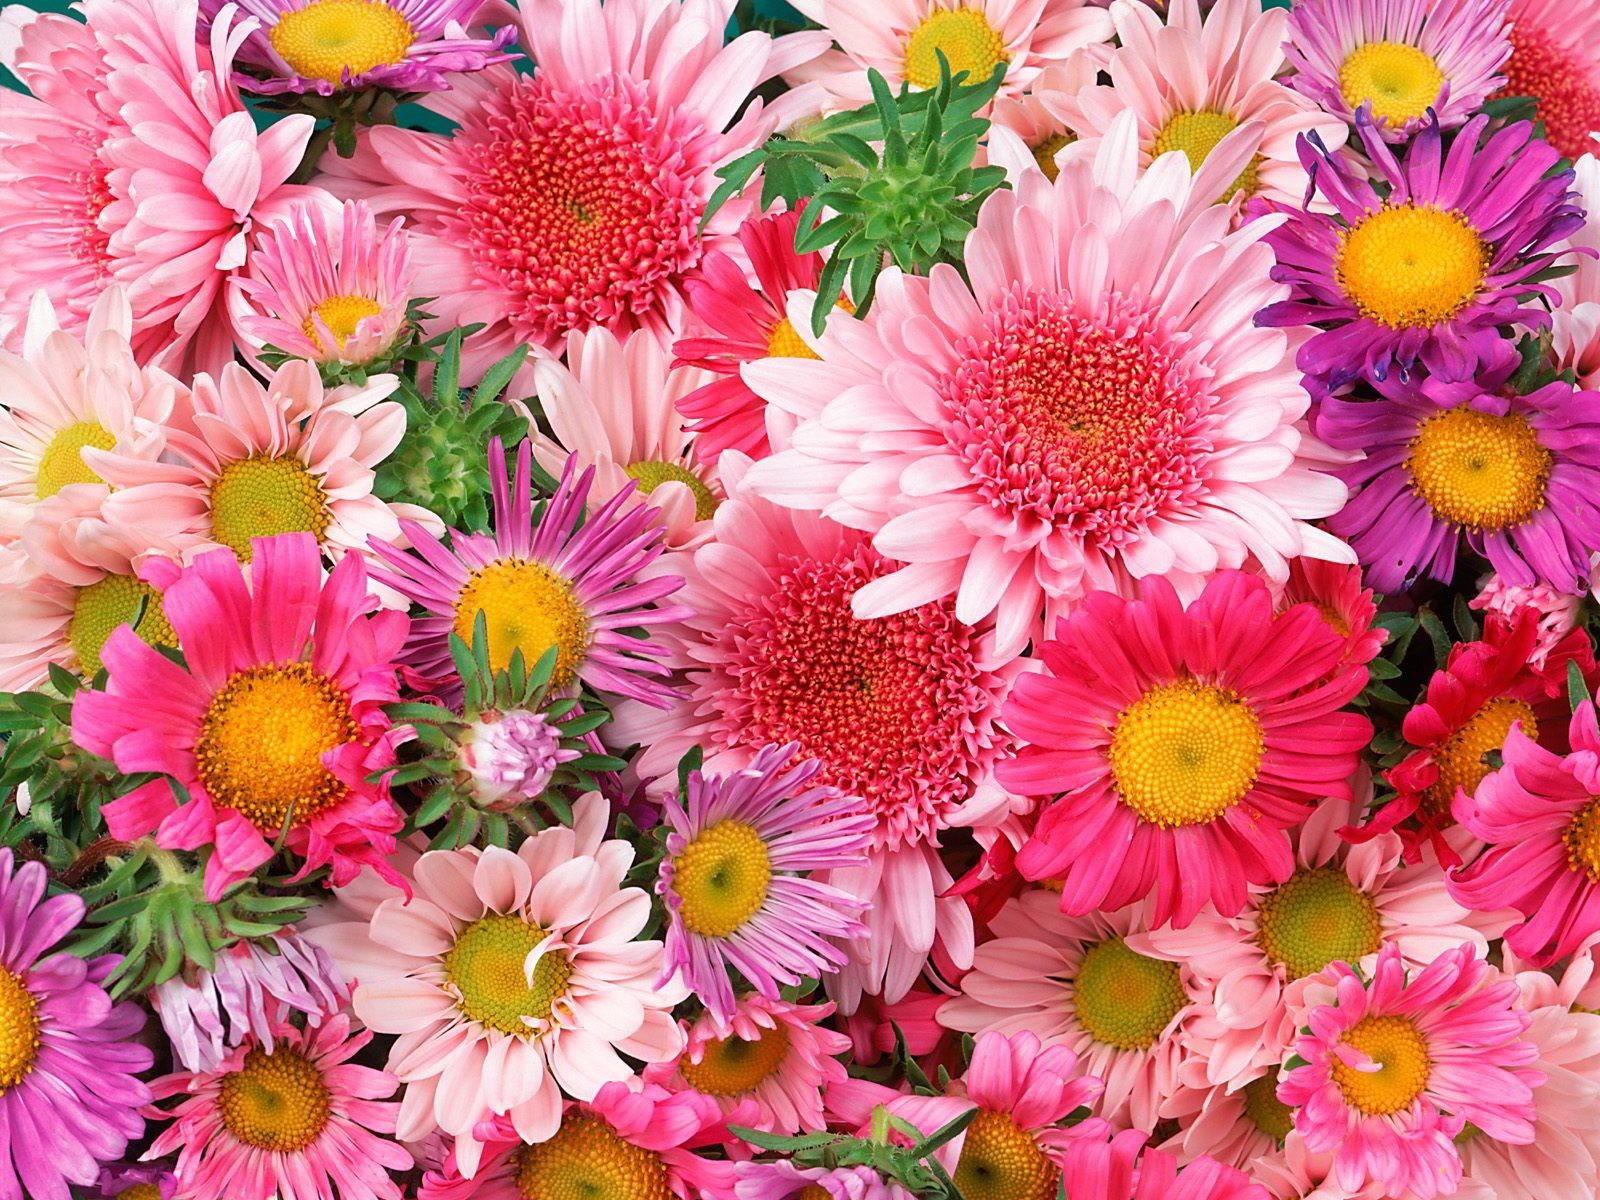 hinh anh hoa cuc dep 80